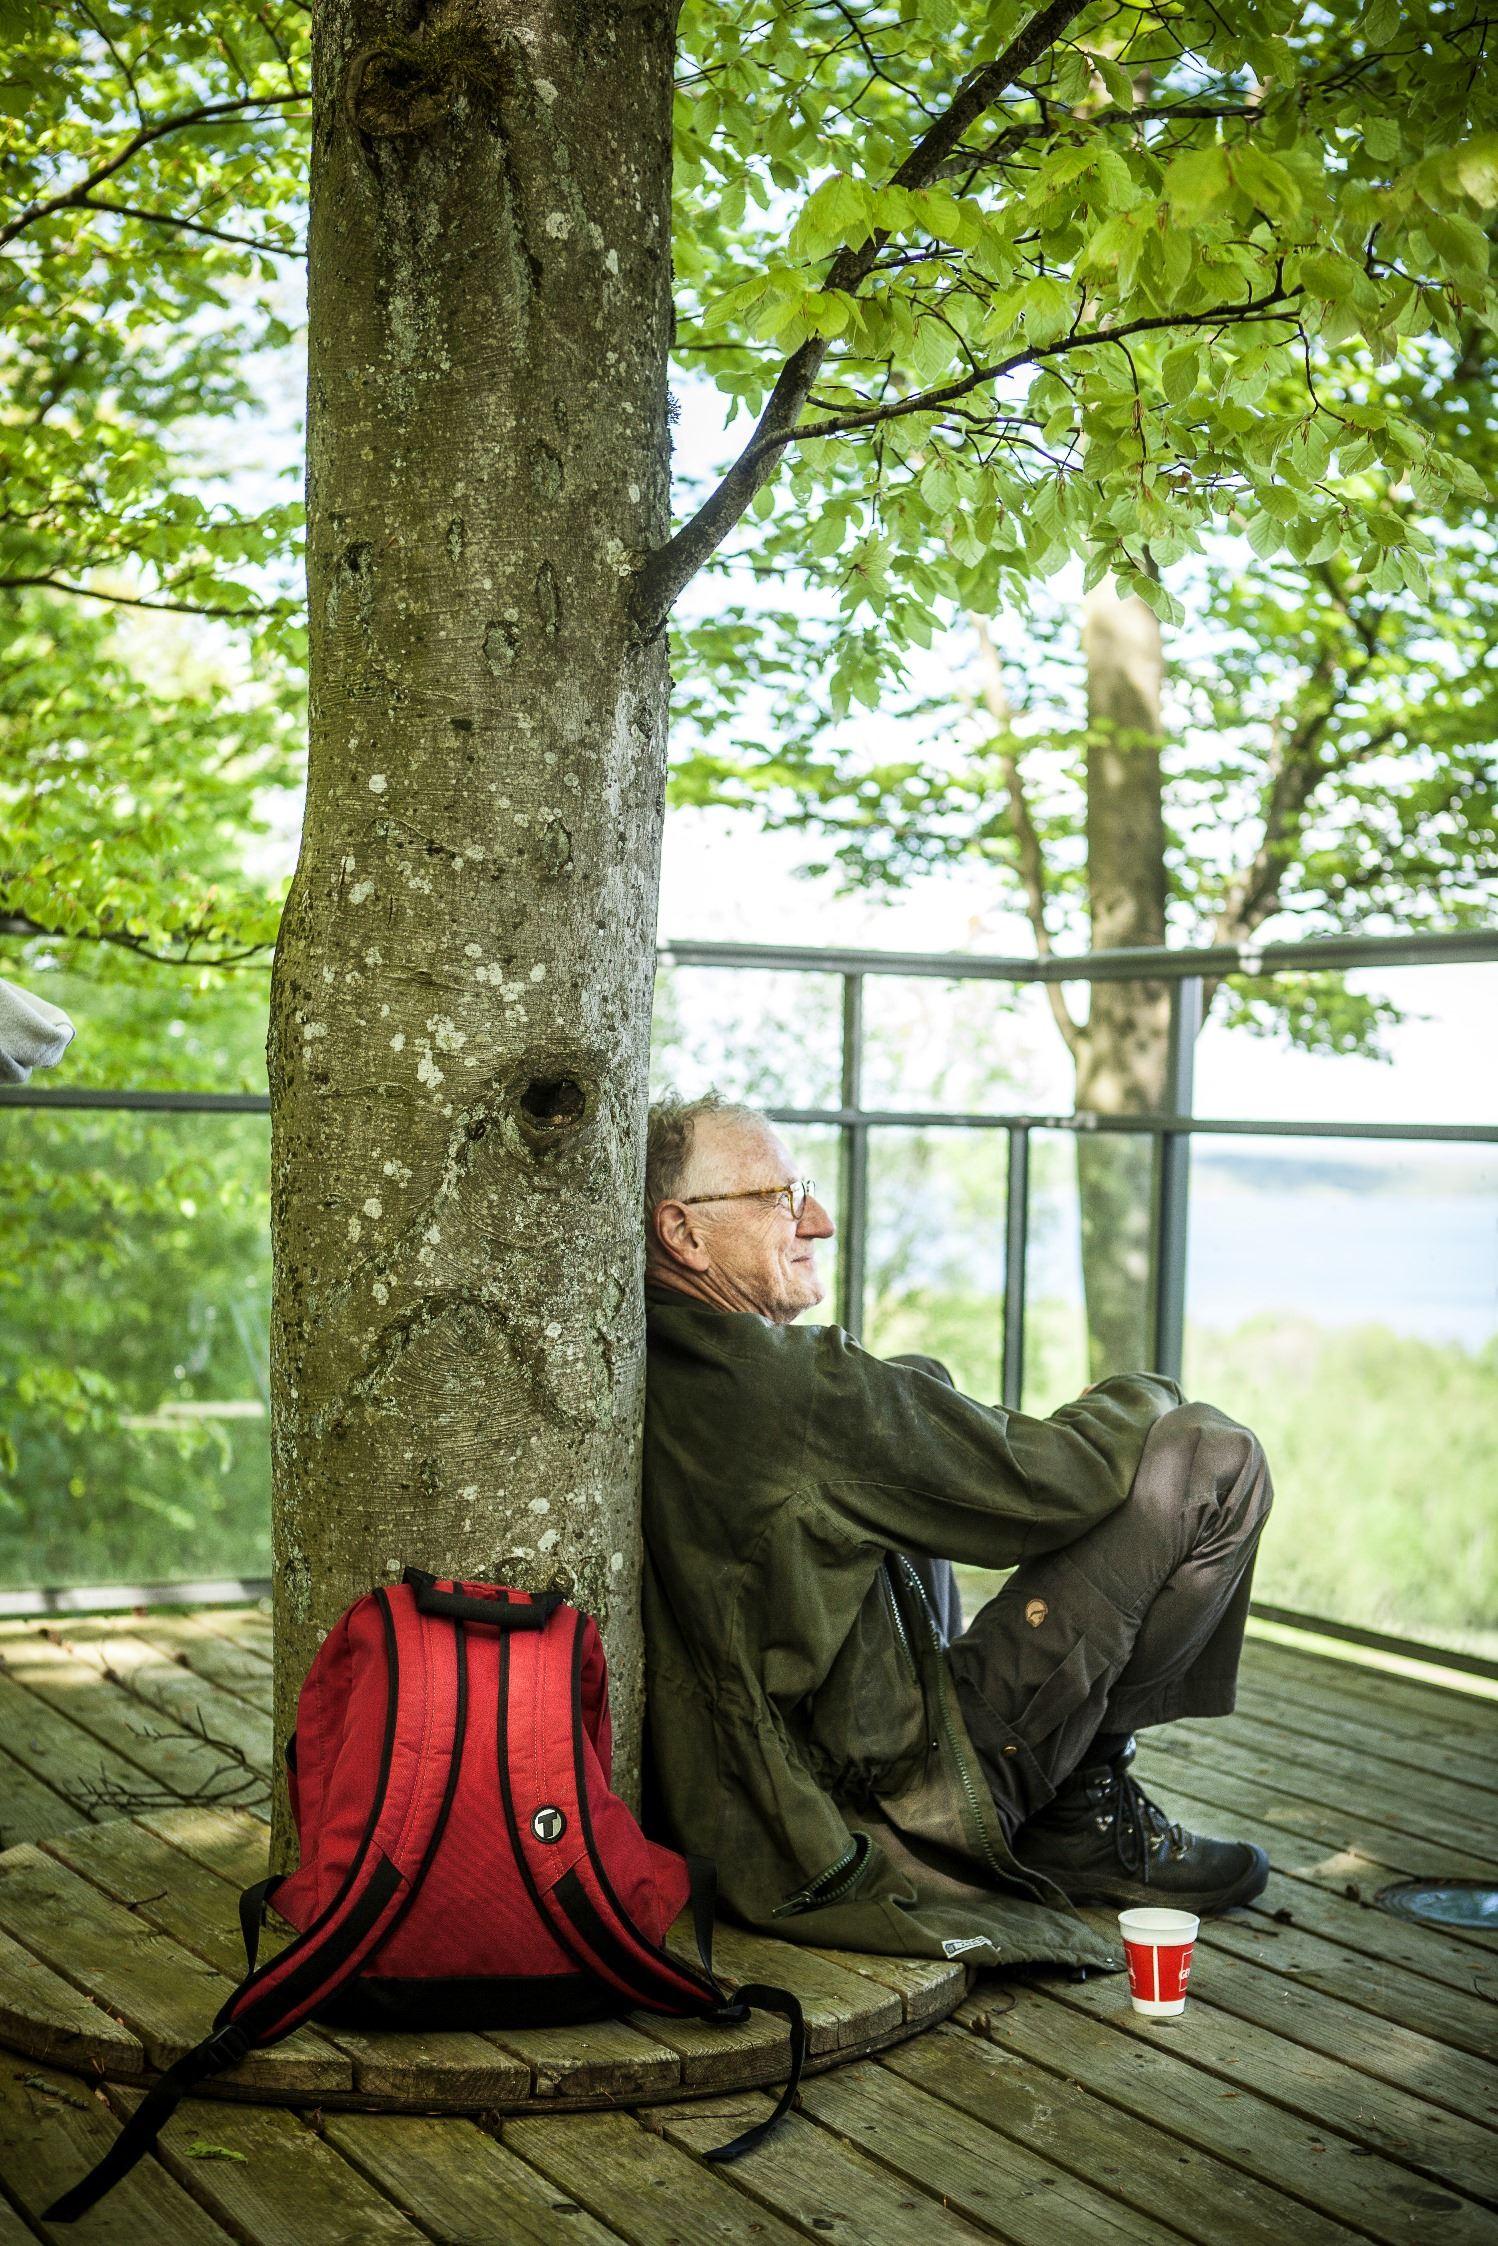 Foto: Fotograf Funke, Hovdala Vandringscentrum